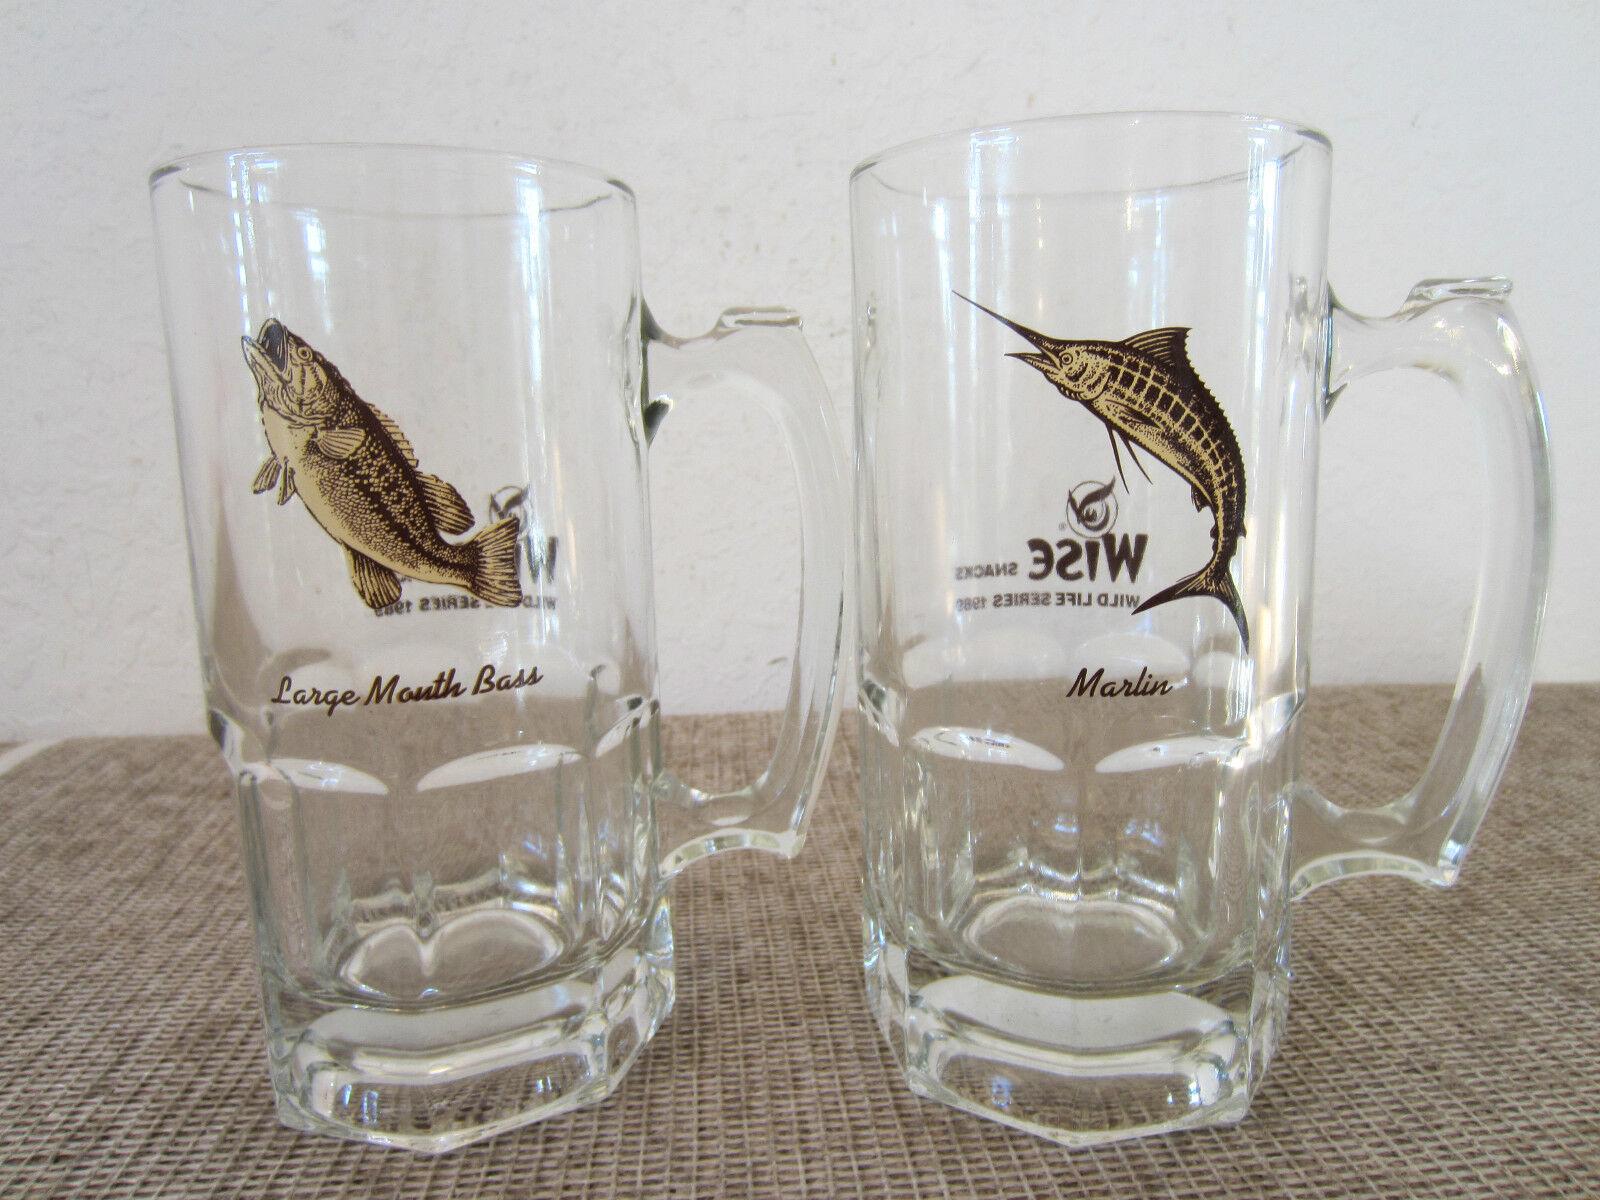 PR  OF LG SALTWATER FISHING MOTIF GLASS STEINS  beautiful